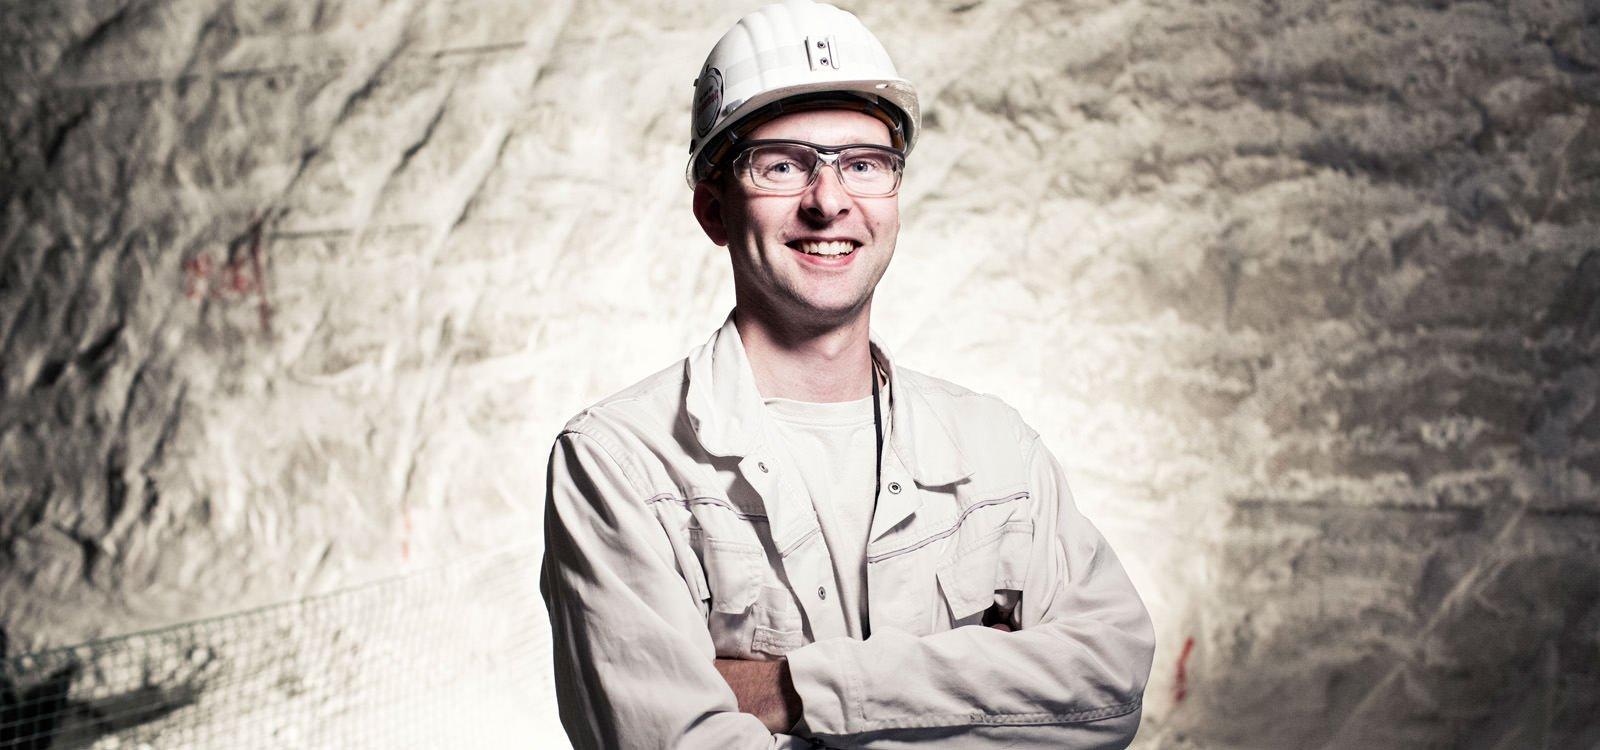 <p>过去两年间,Hans-Martin Müller一直在位于德国贝恩堡的esco盐矿负责地下生产工作。</p>